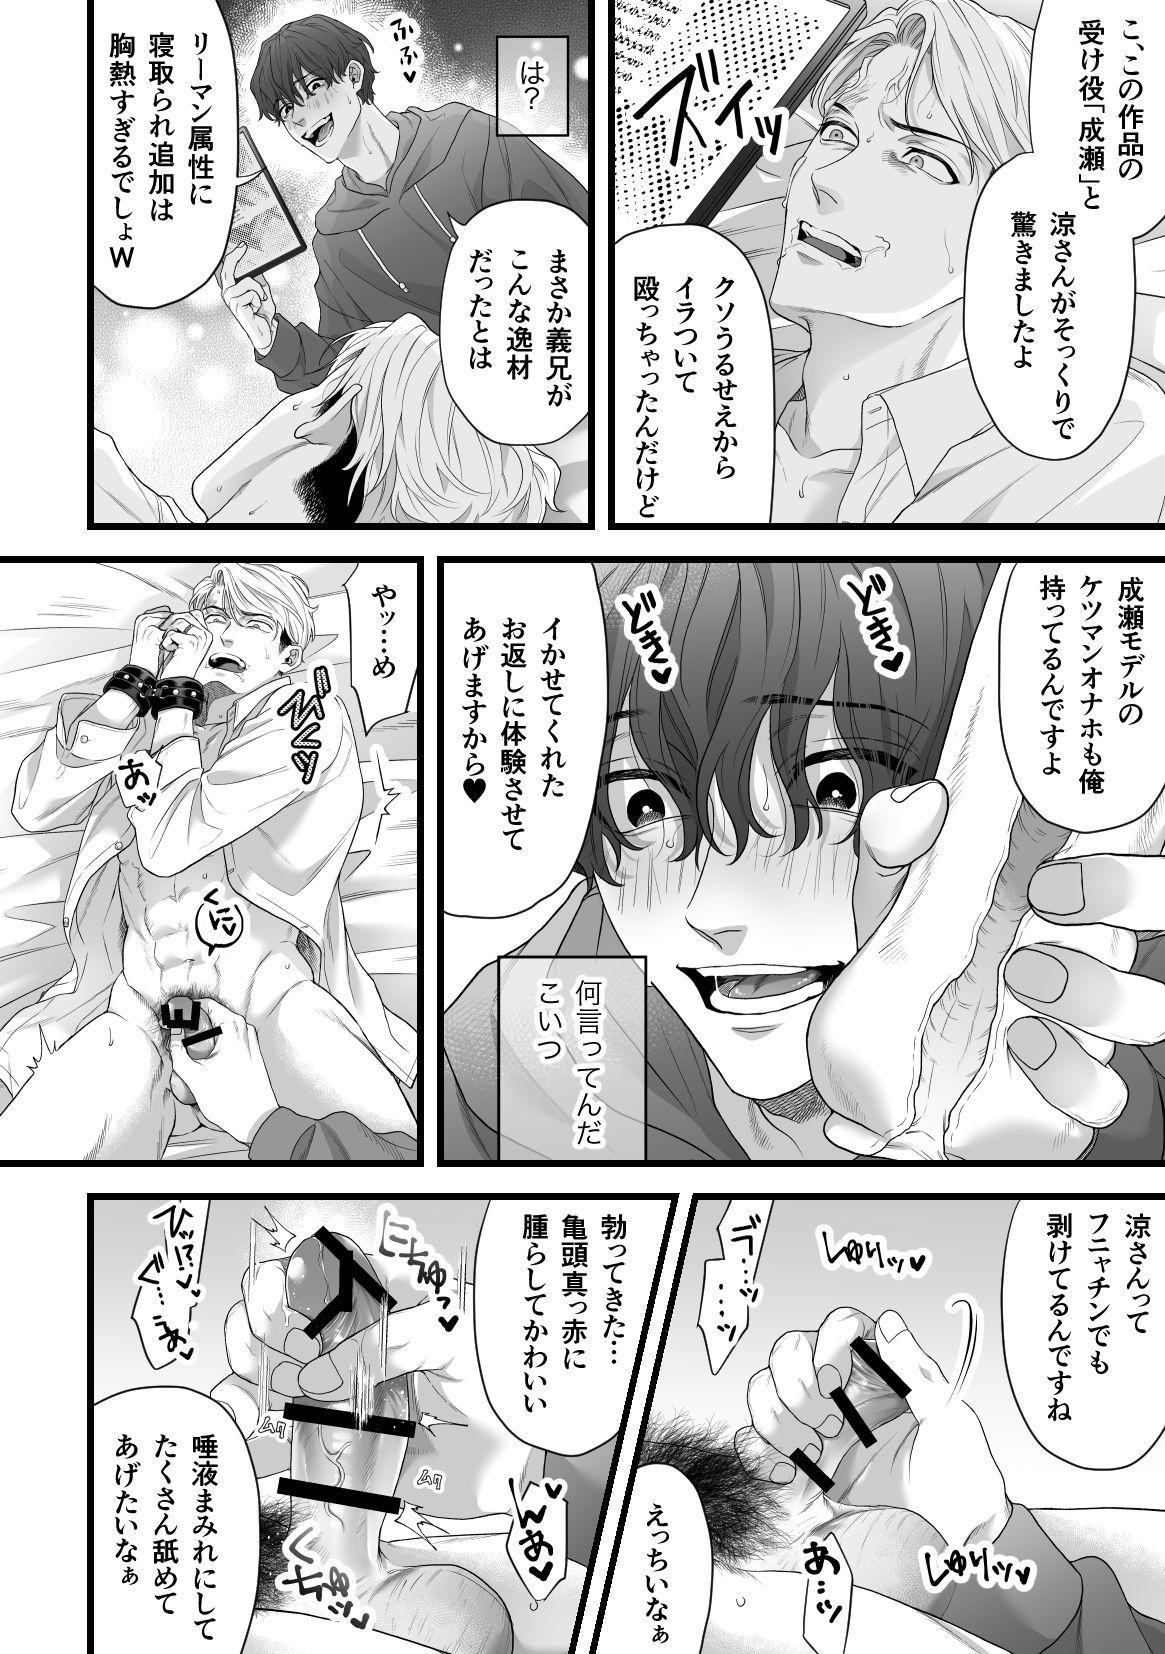 Gikei Ryoujoku 13